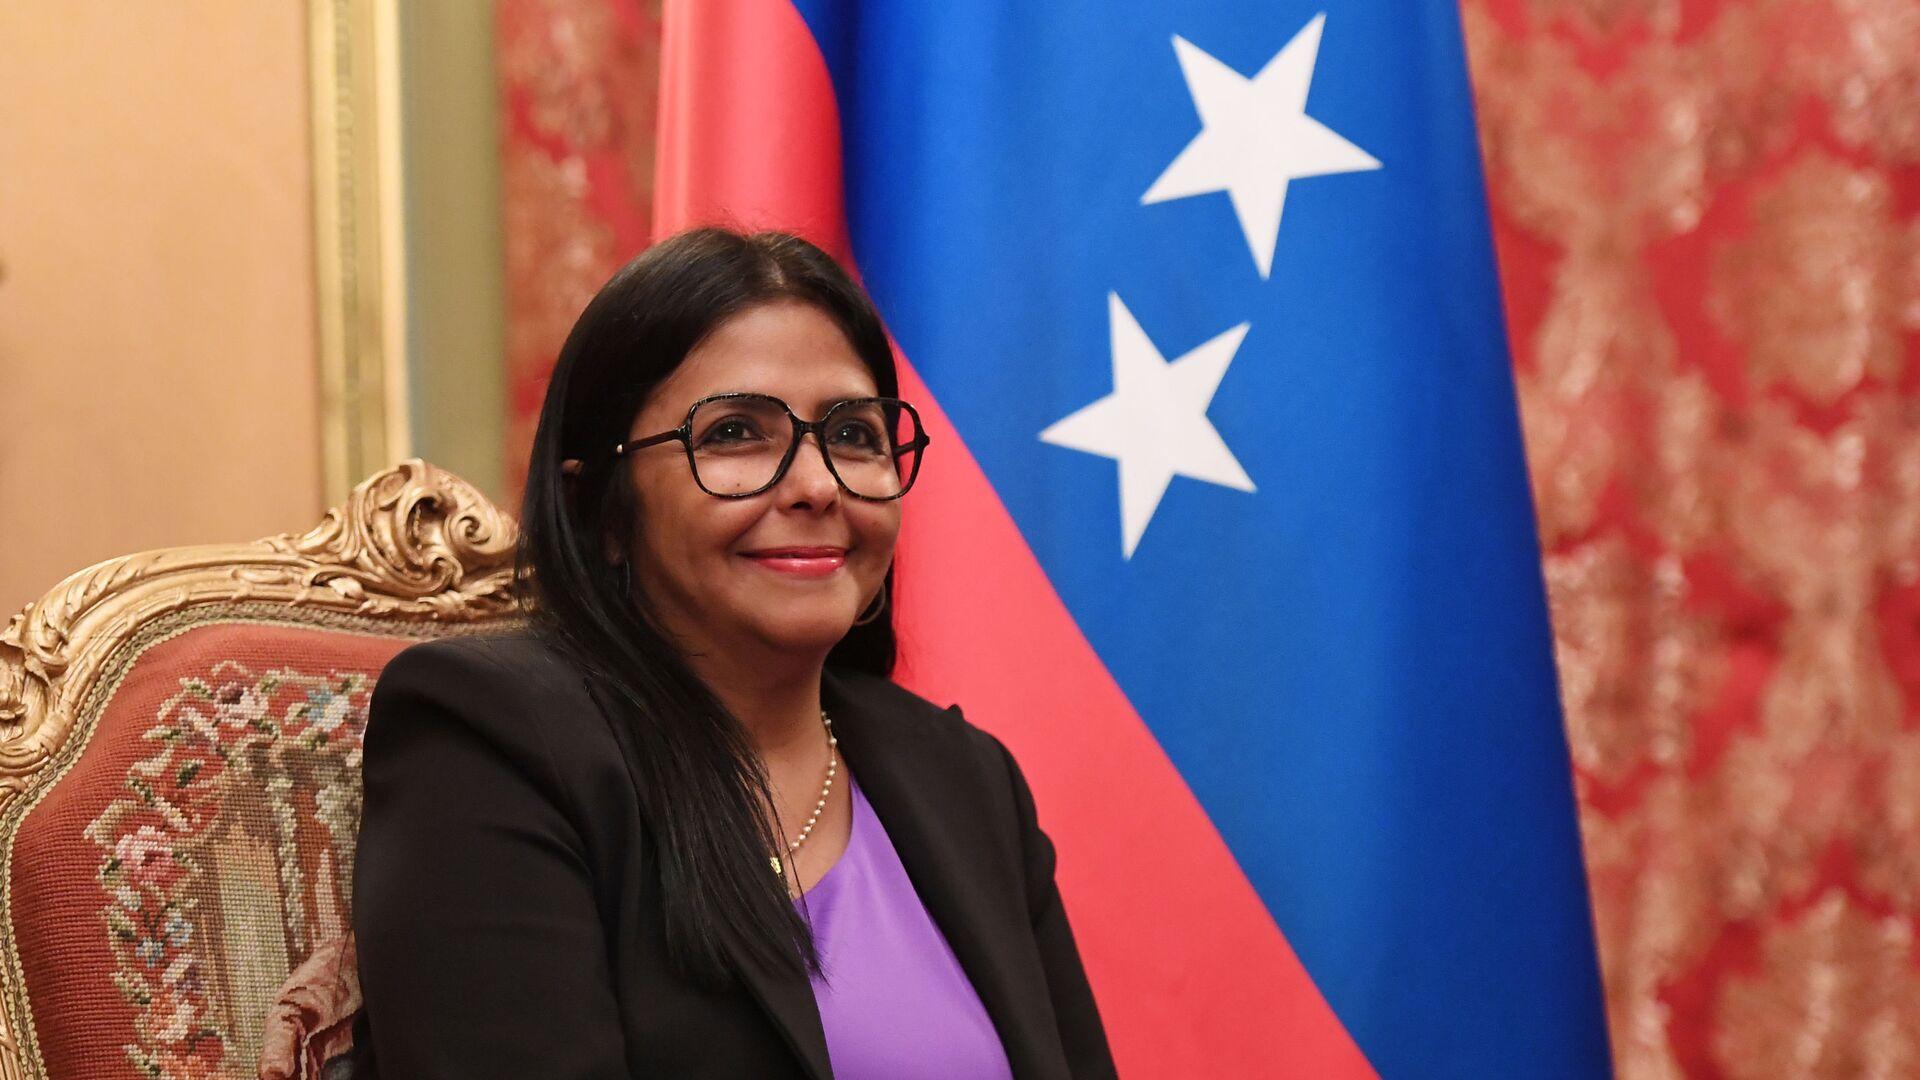 Delcy Rodríguez, vicepresidenta de Venezuela - Sputnik Mundo, 1920, 27.09.2021